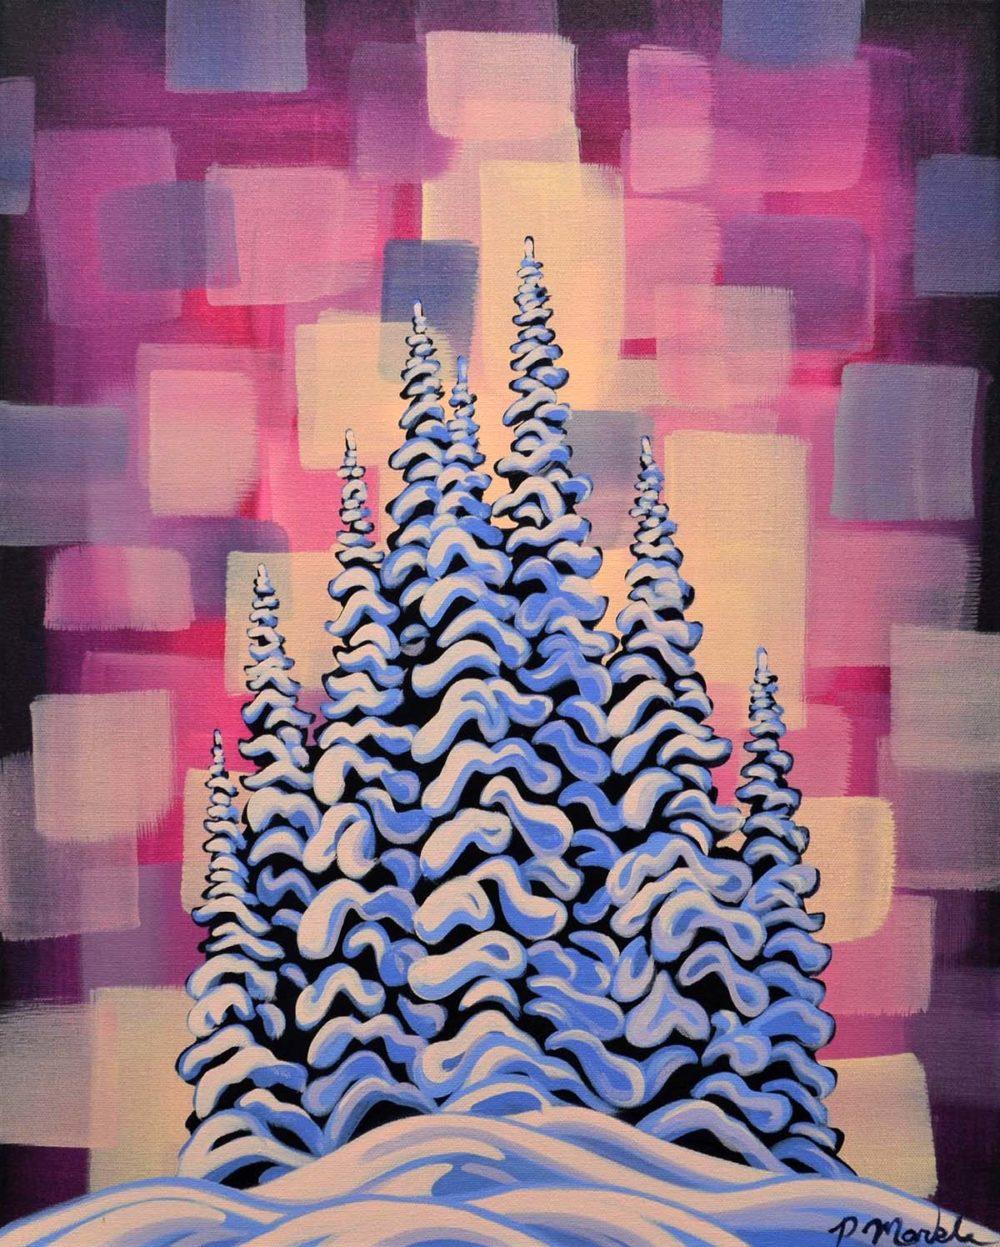 Snow Ghosts - Patrick Markle